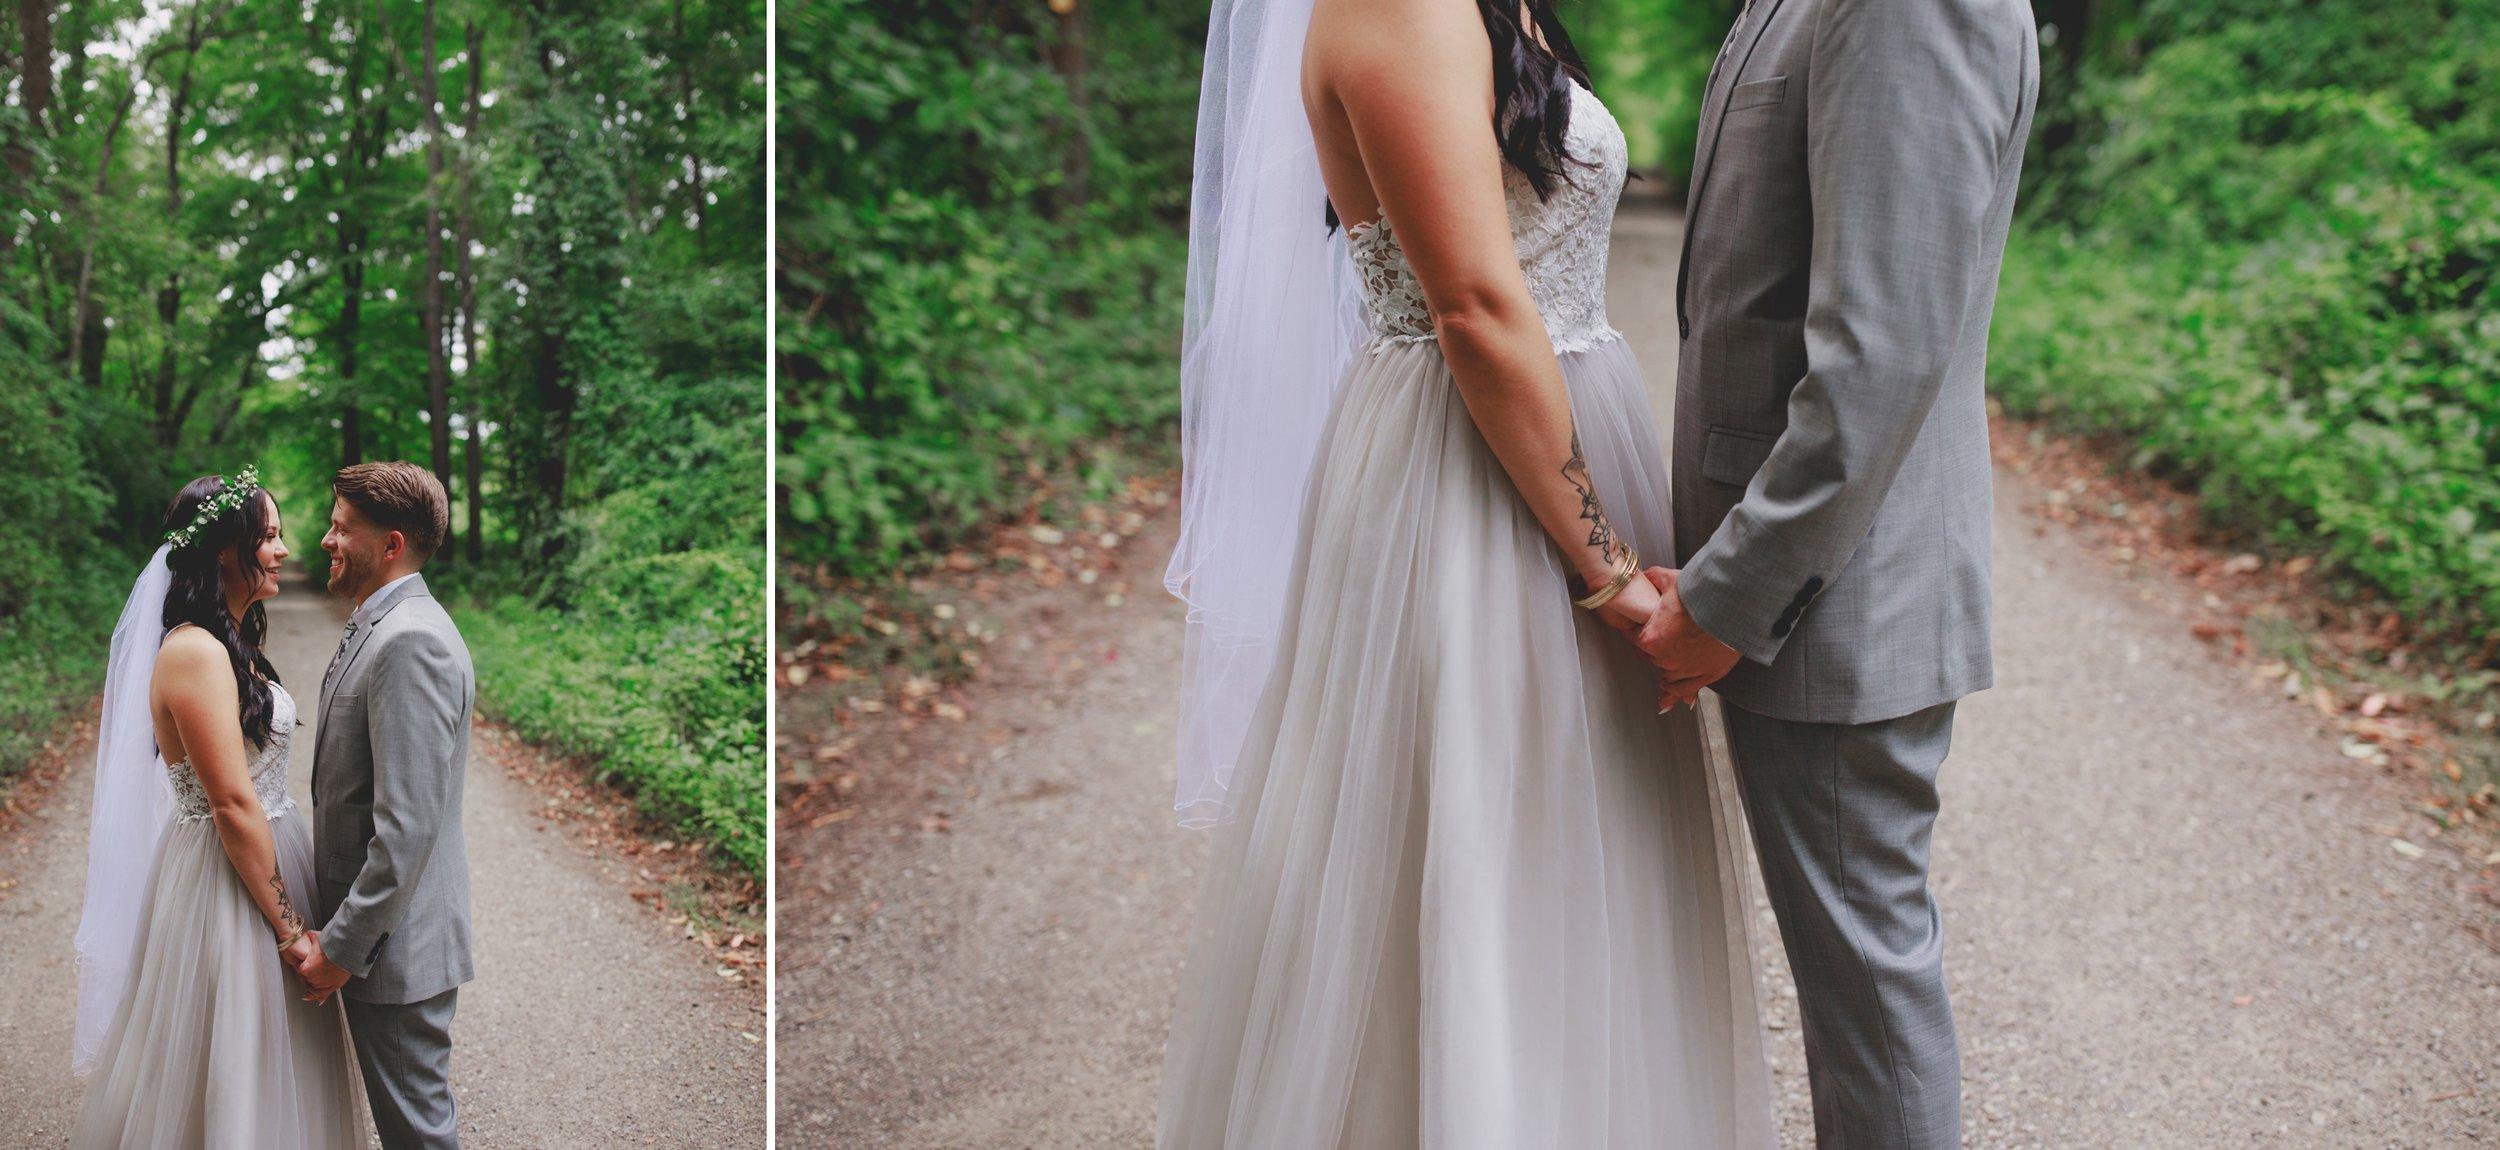 amanda_vanvels_michigan_camp_wedding_040.jpg